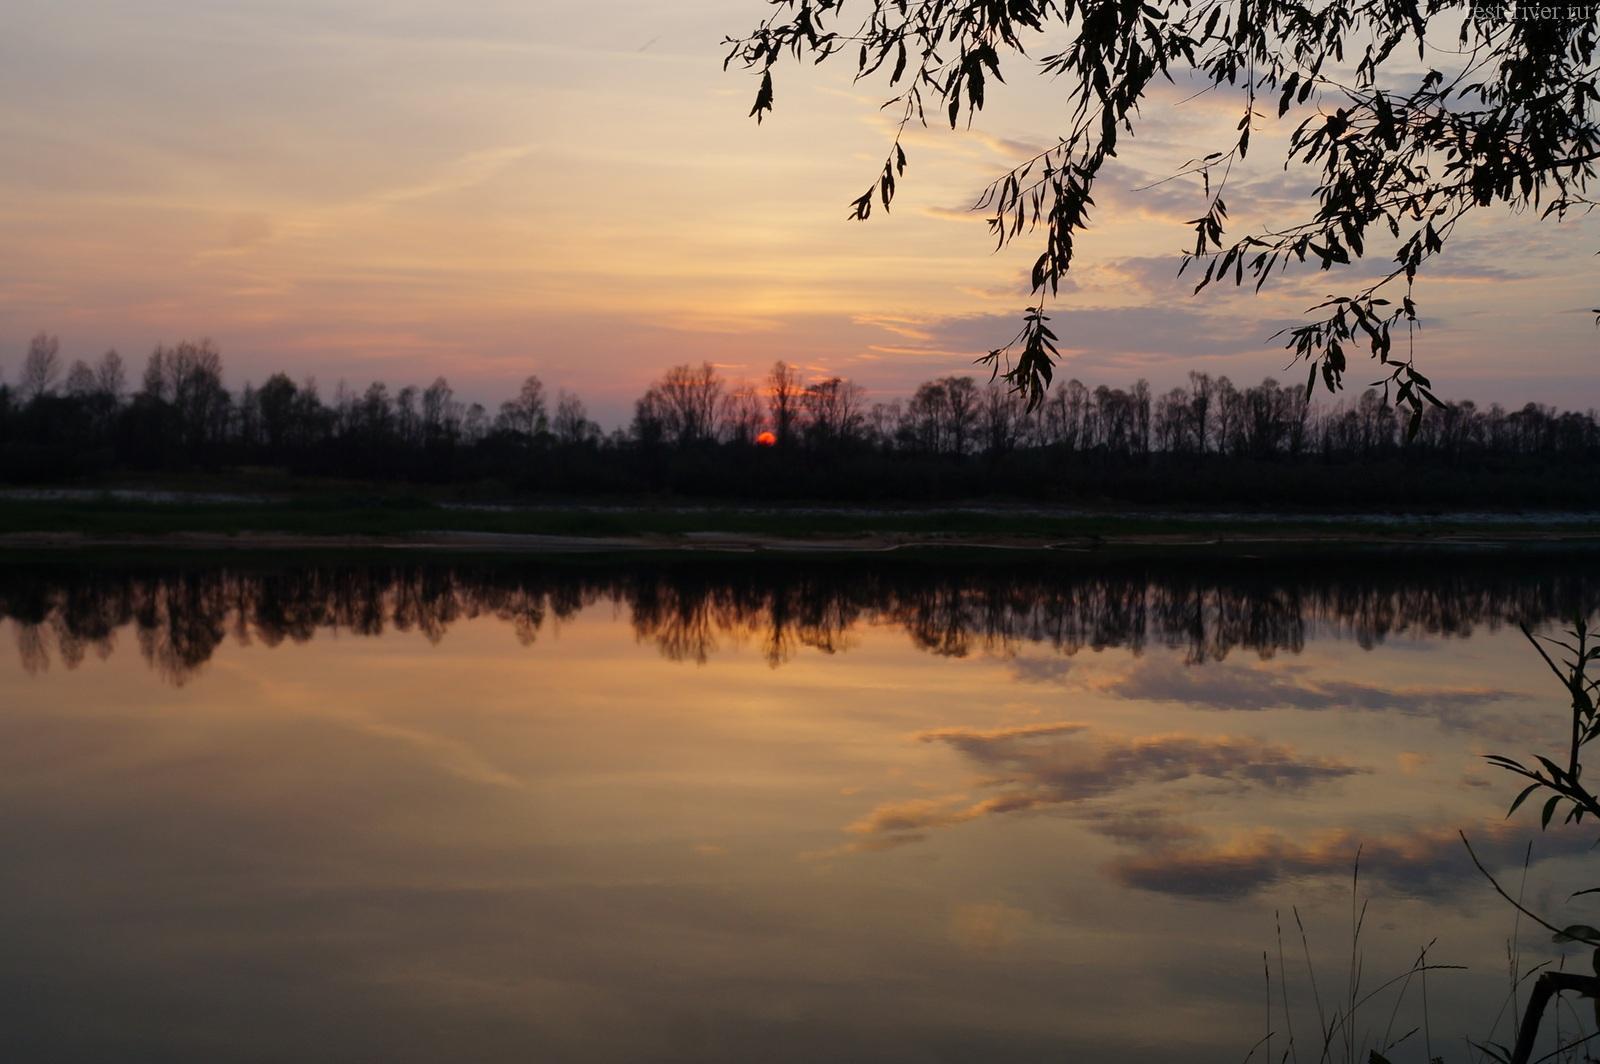 красивое фото реки закат на реке и отражение облаков в воде